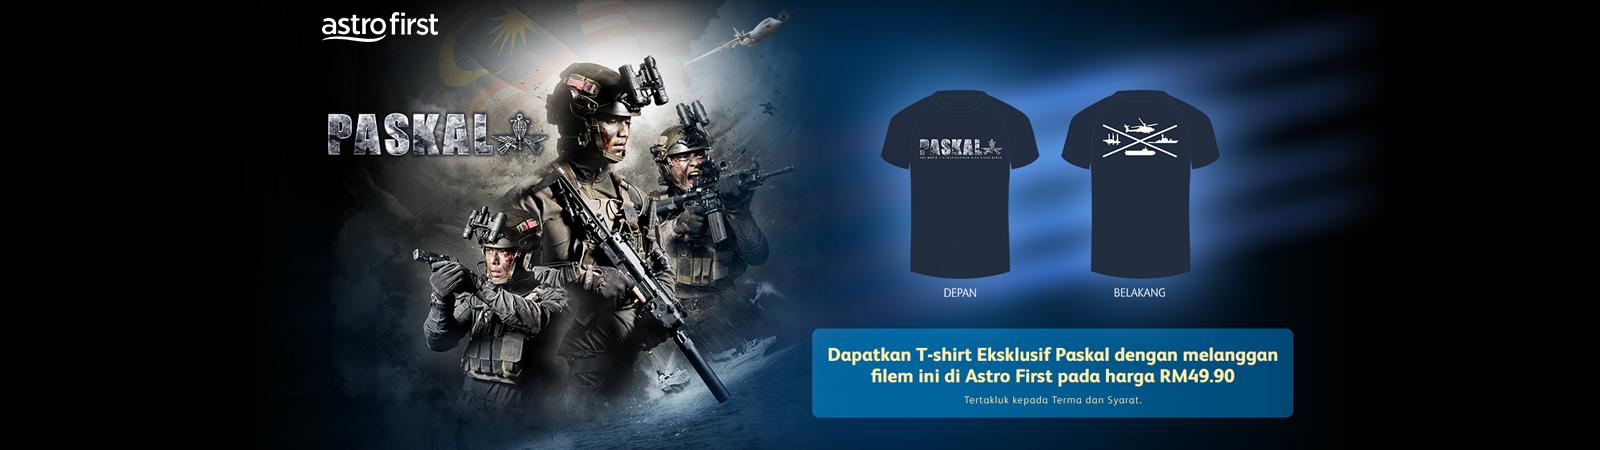 Paskal + T.Shirt Eksklusif